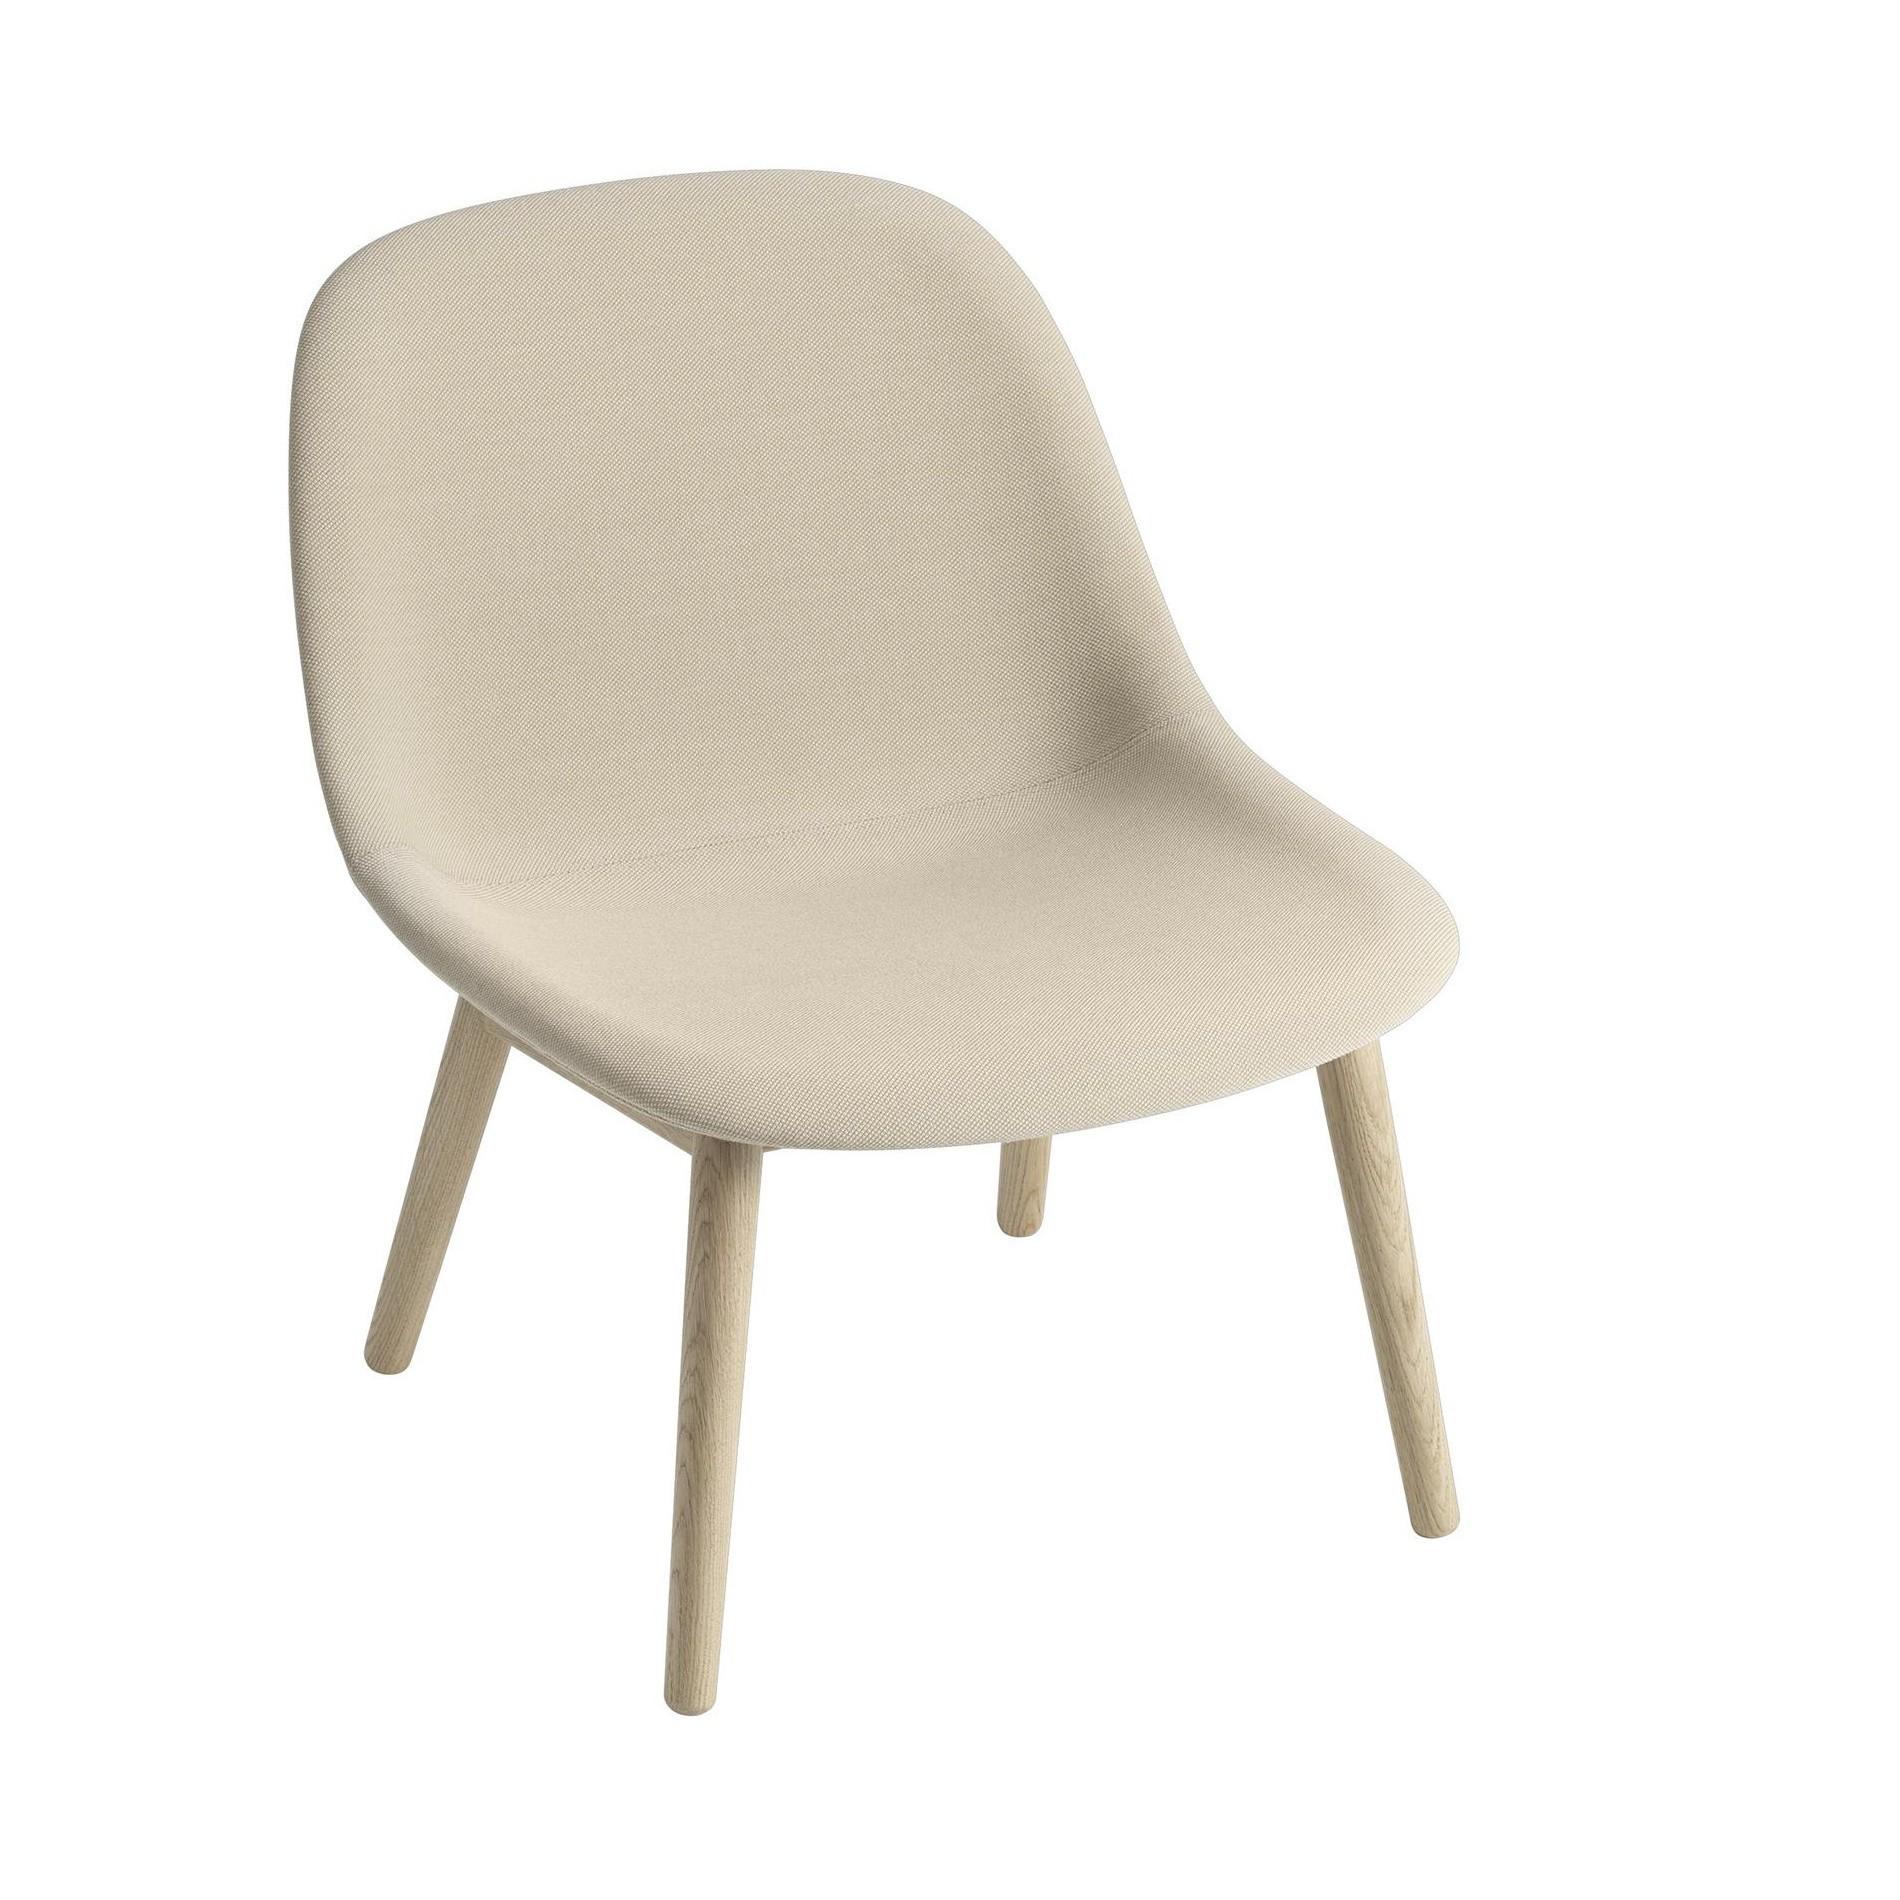 muuto fiber lounge chair wood base ambientedirect. Black Bedroom Furniture Sets. Home Design Ideas